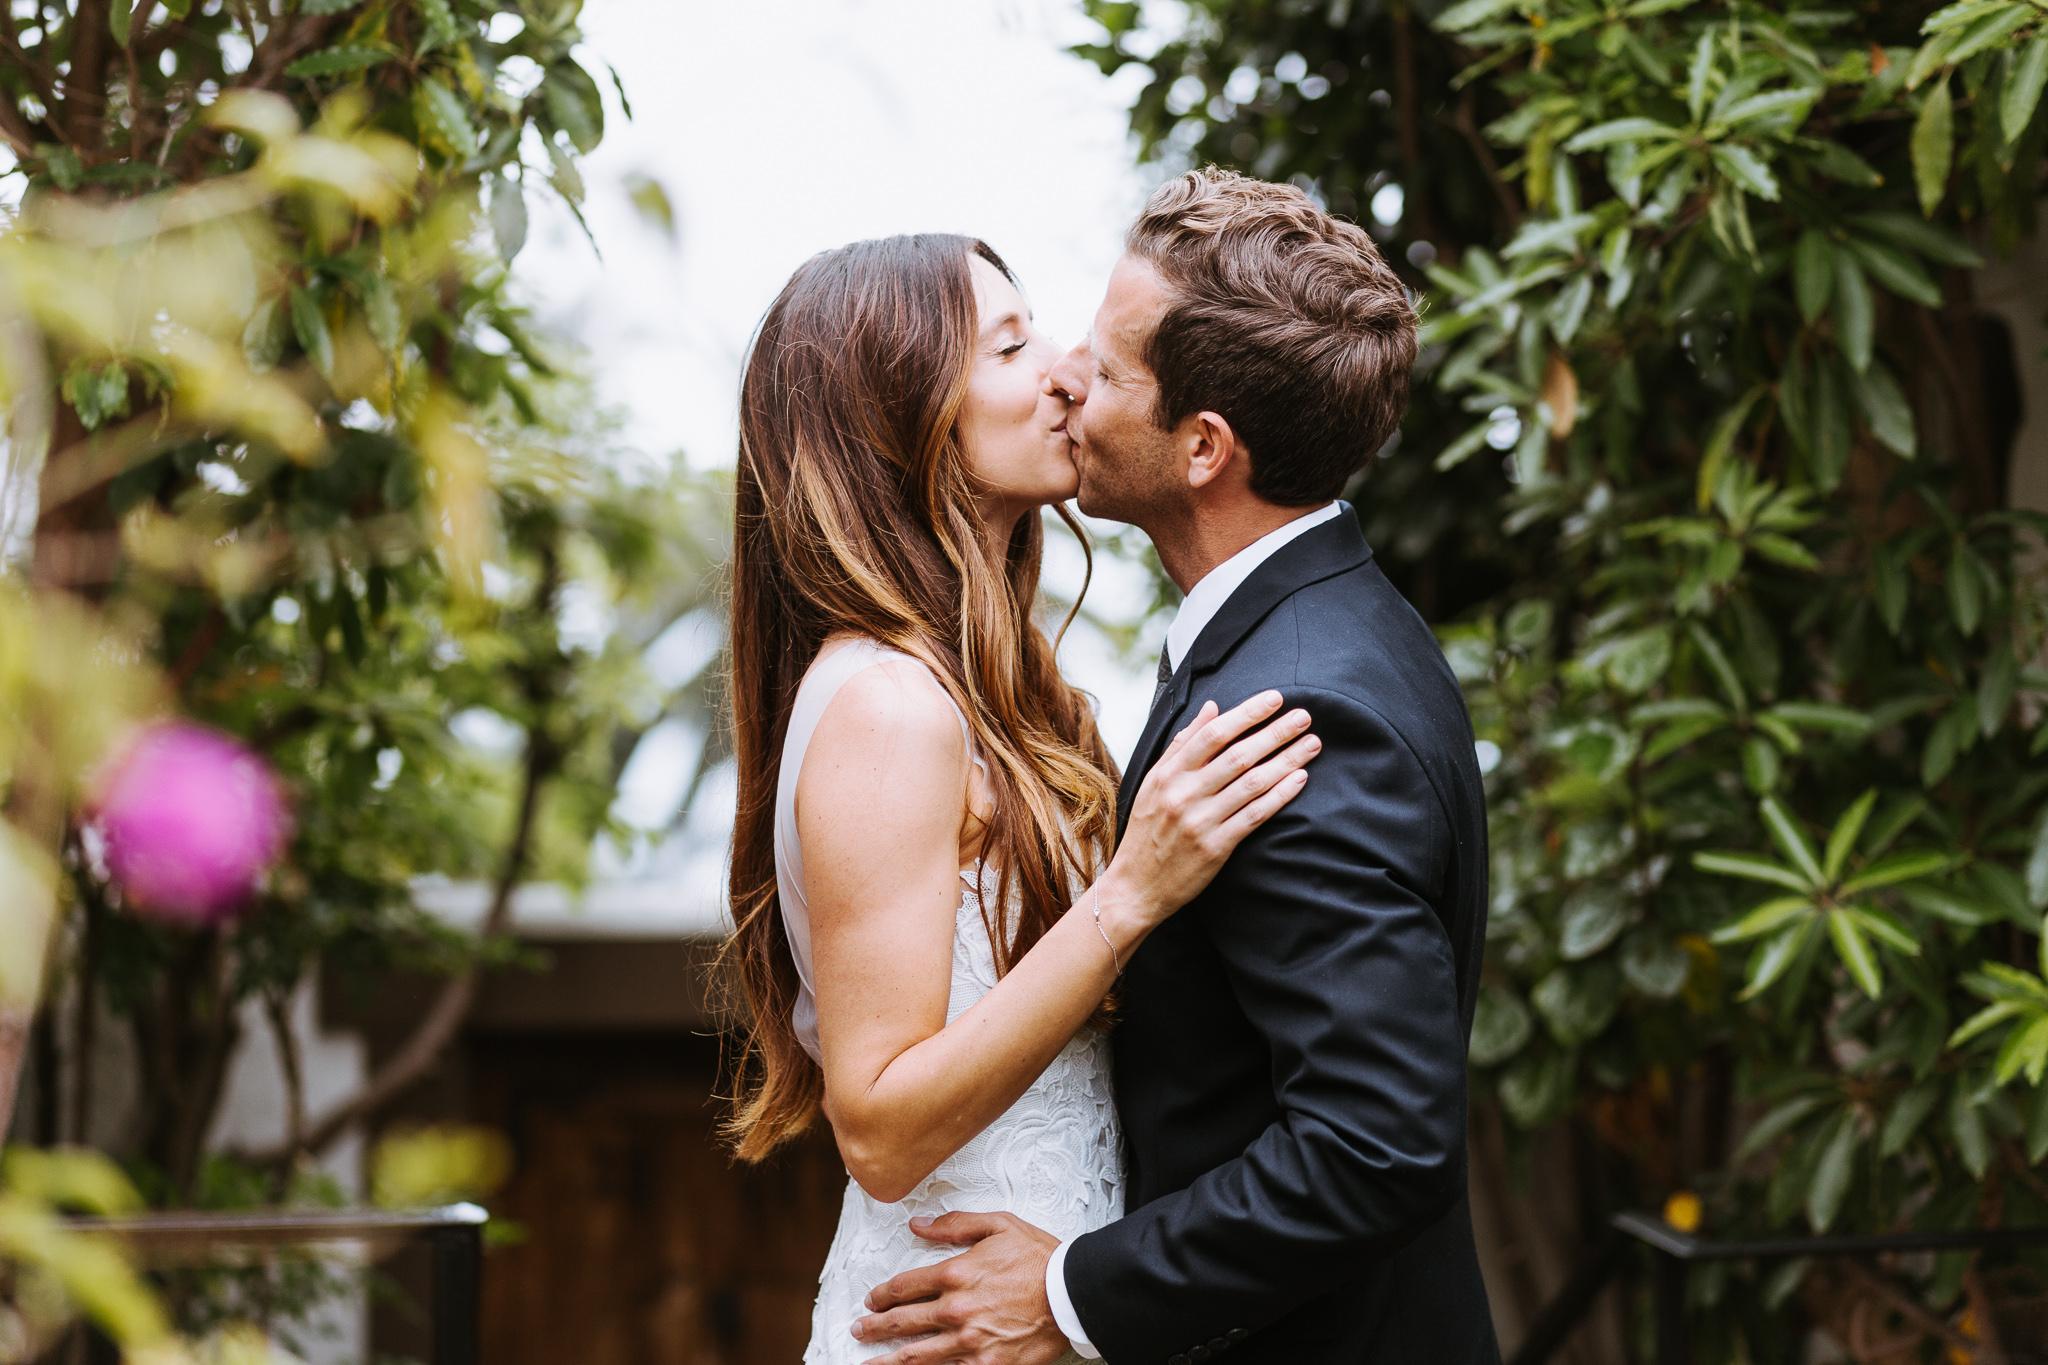 LagunaBeach-WeddingPhotographer-18.jpg